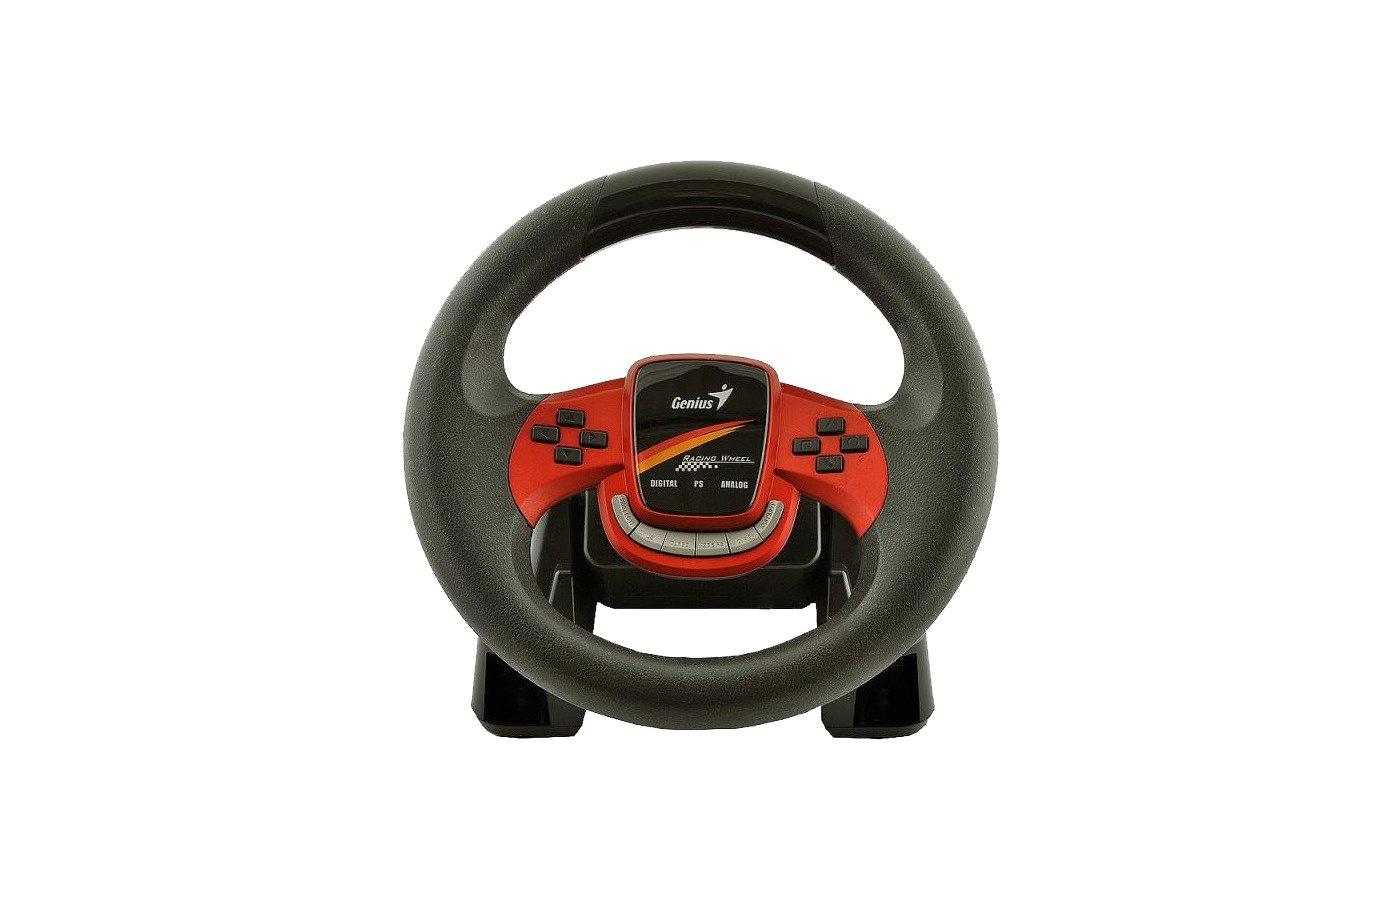 Руль Genius Twin Wheel FX с виброотдачей